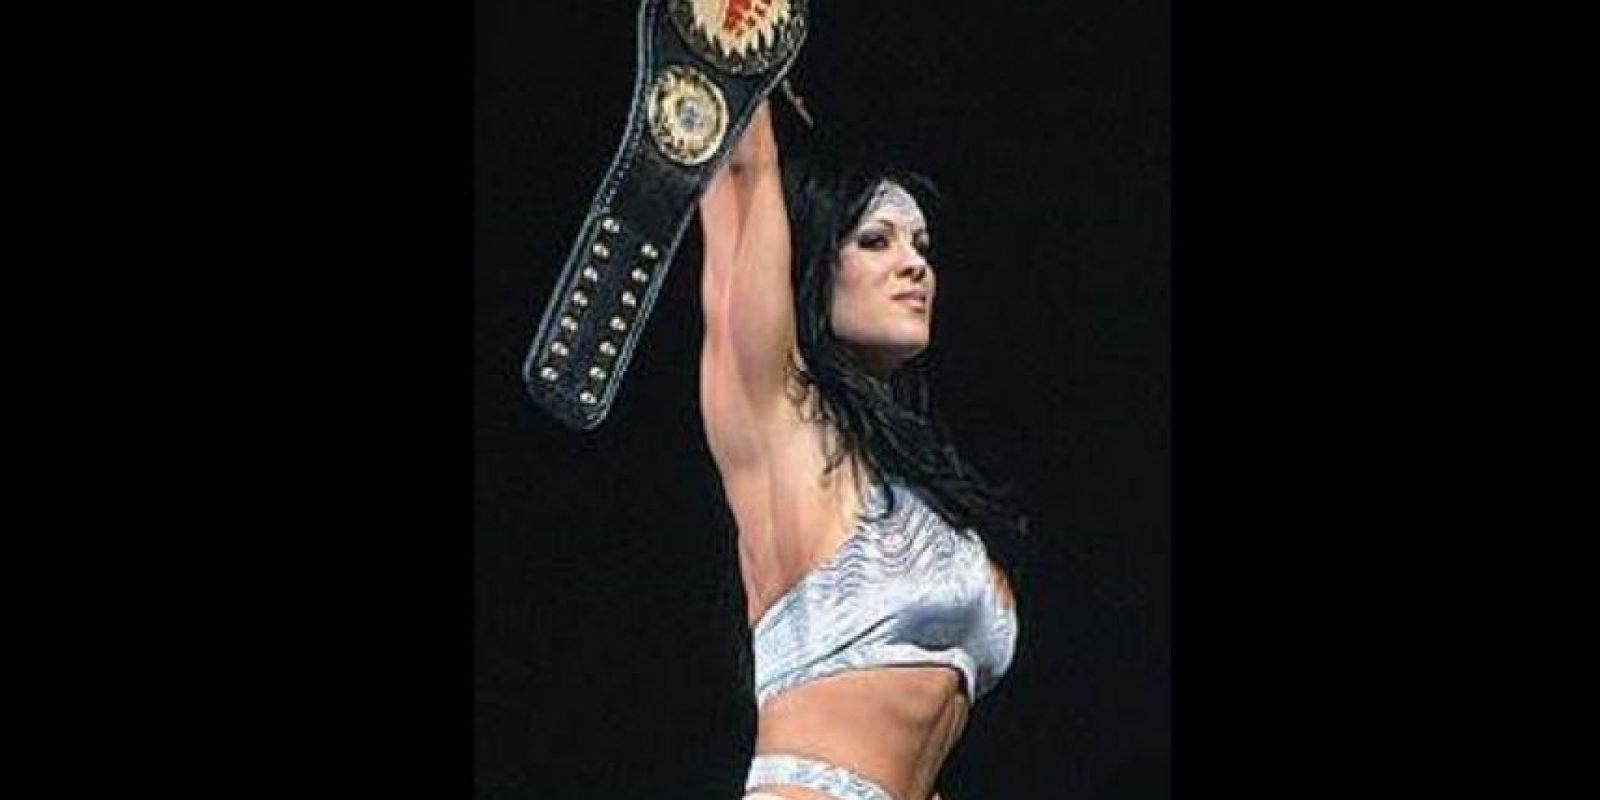 3. Chyna en el cine porno Foto:WWE